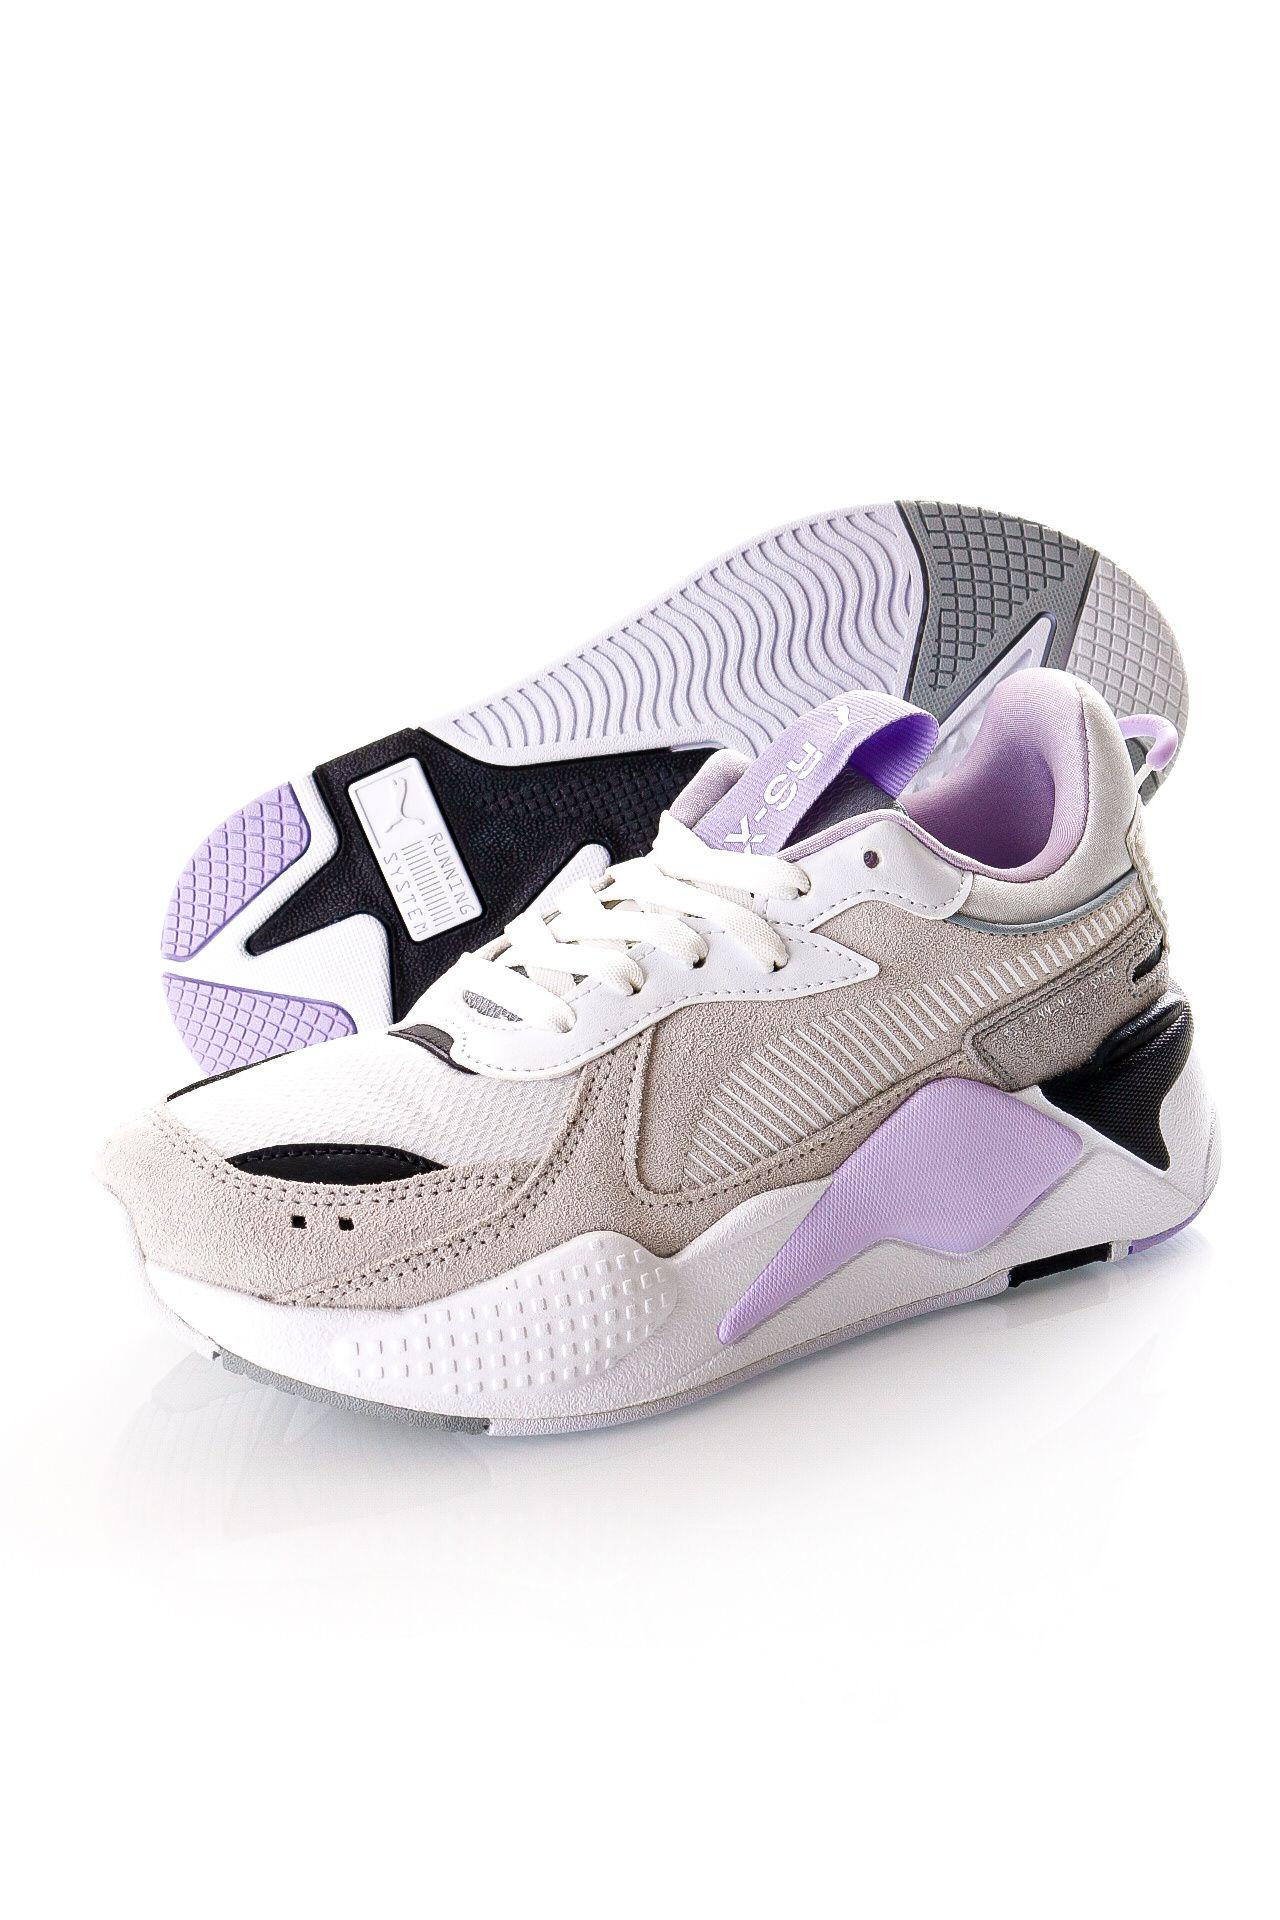 Afbeelding van Puma Sneakers RS-X Reinvent Wn's Nimbus Cloud-Puma White-Light Lavender 37100816